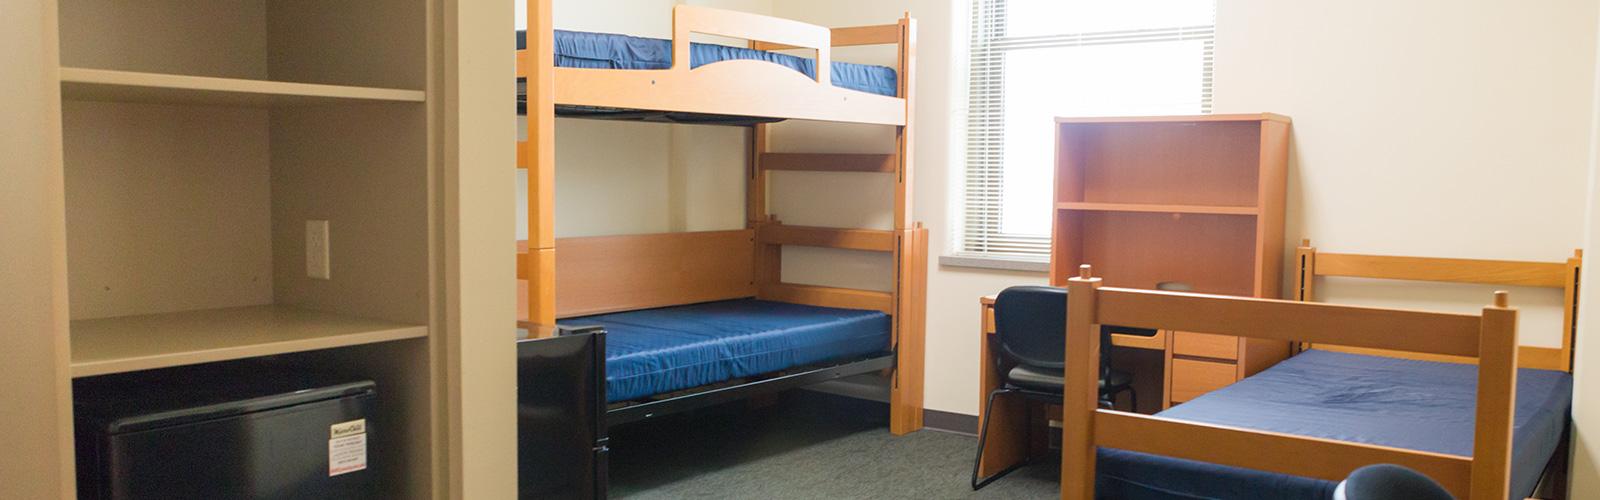 Triple room in Dejope Residence Hall